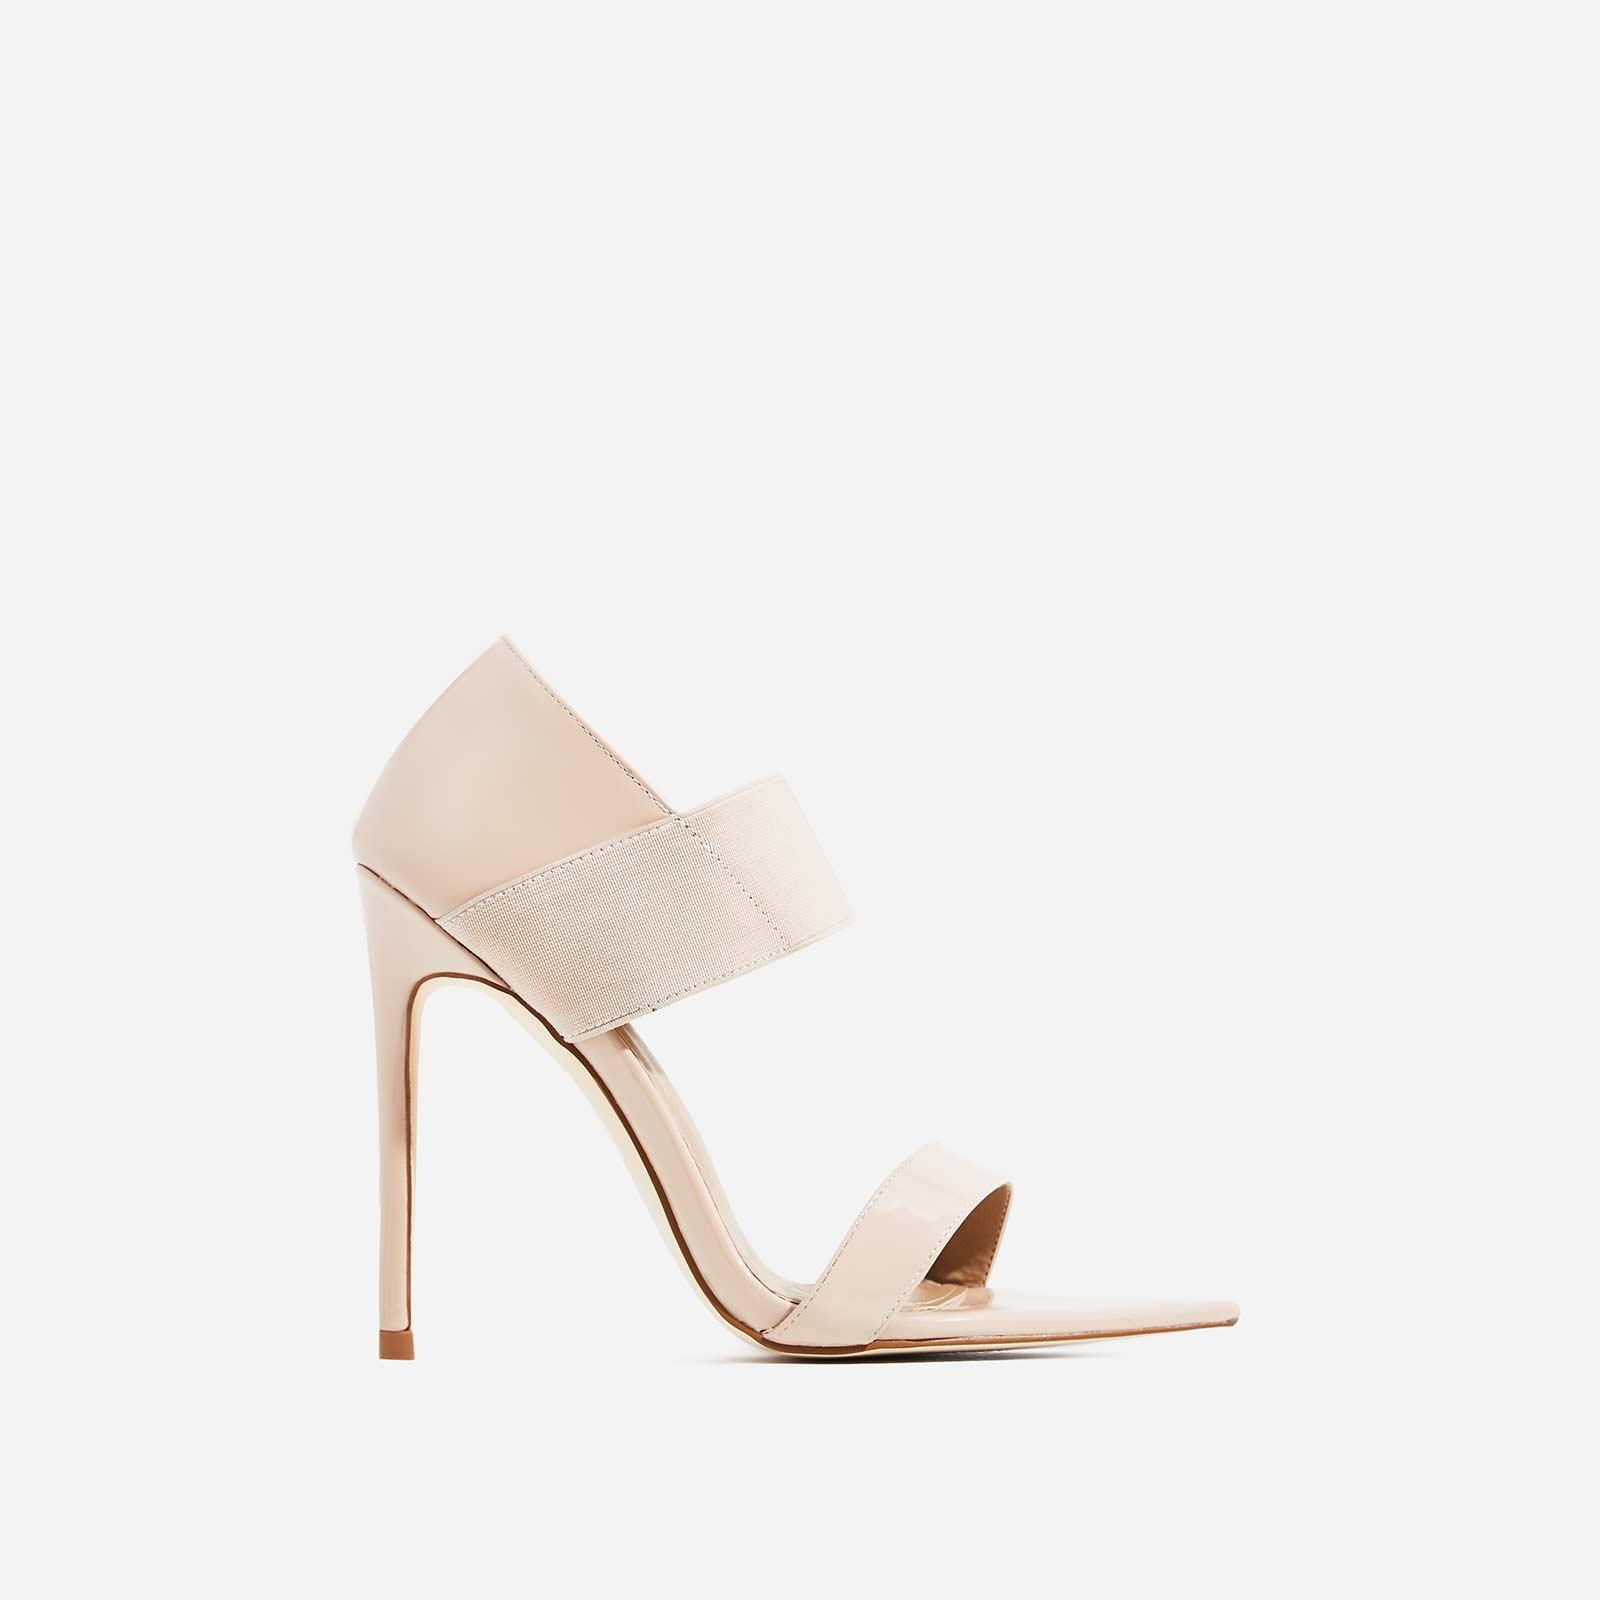 Erika Elasticated Pointed Peep Toe Heel In Nude Patent